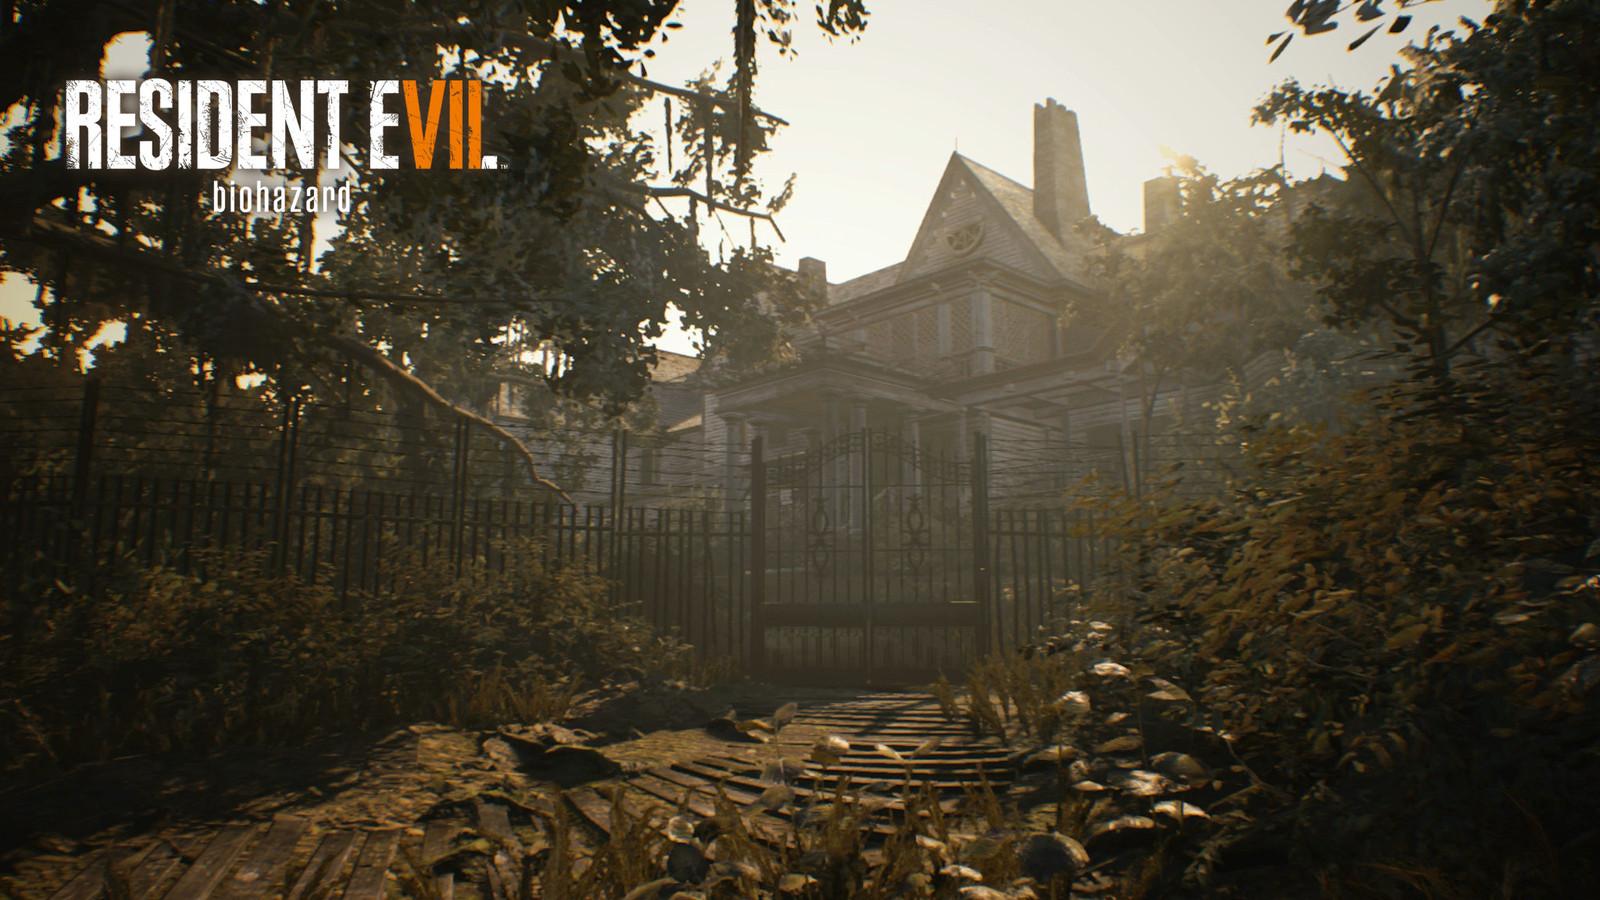 Hci 2018 Resident Evil Biohazard 7 By Federica Pallavicini On Emaze